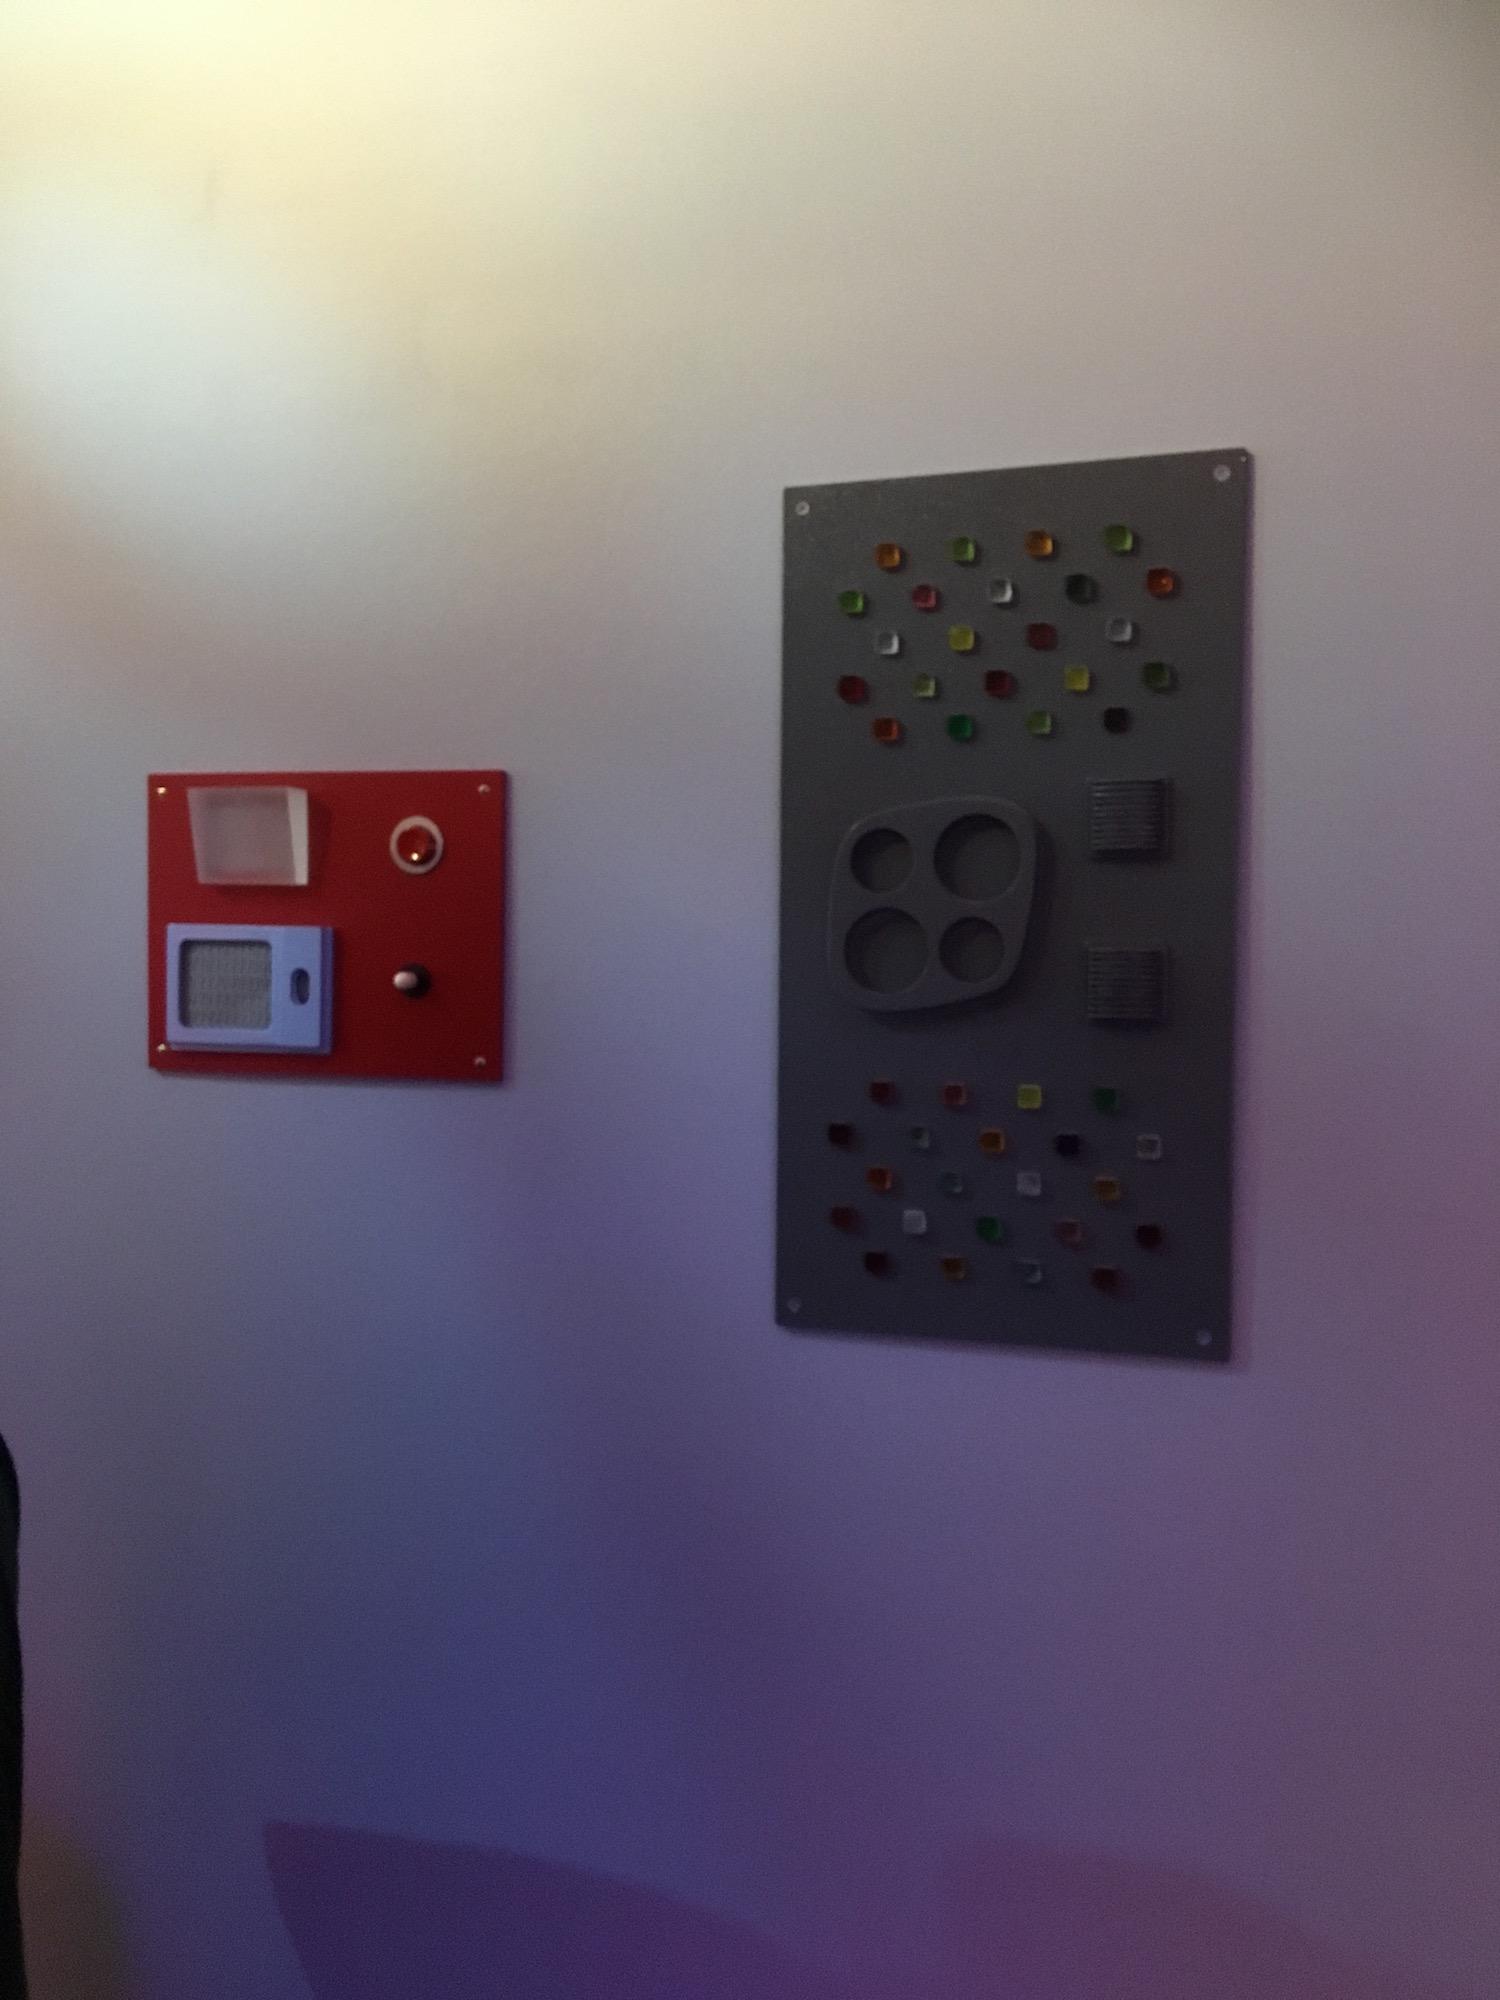 Intercom Panel and Equipment in Corridor ©2017 David R. George III